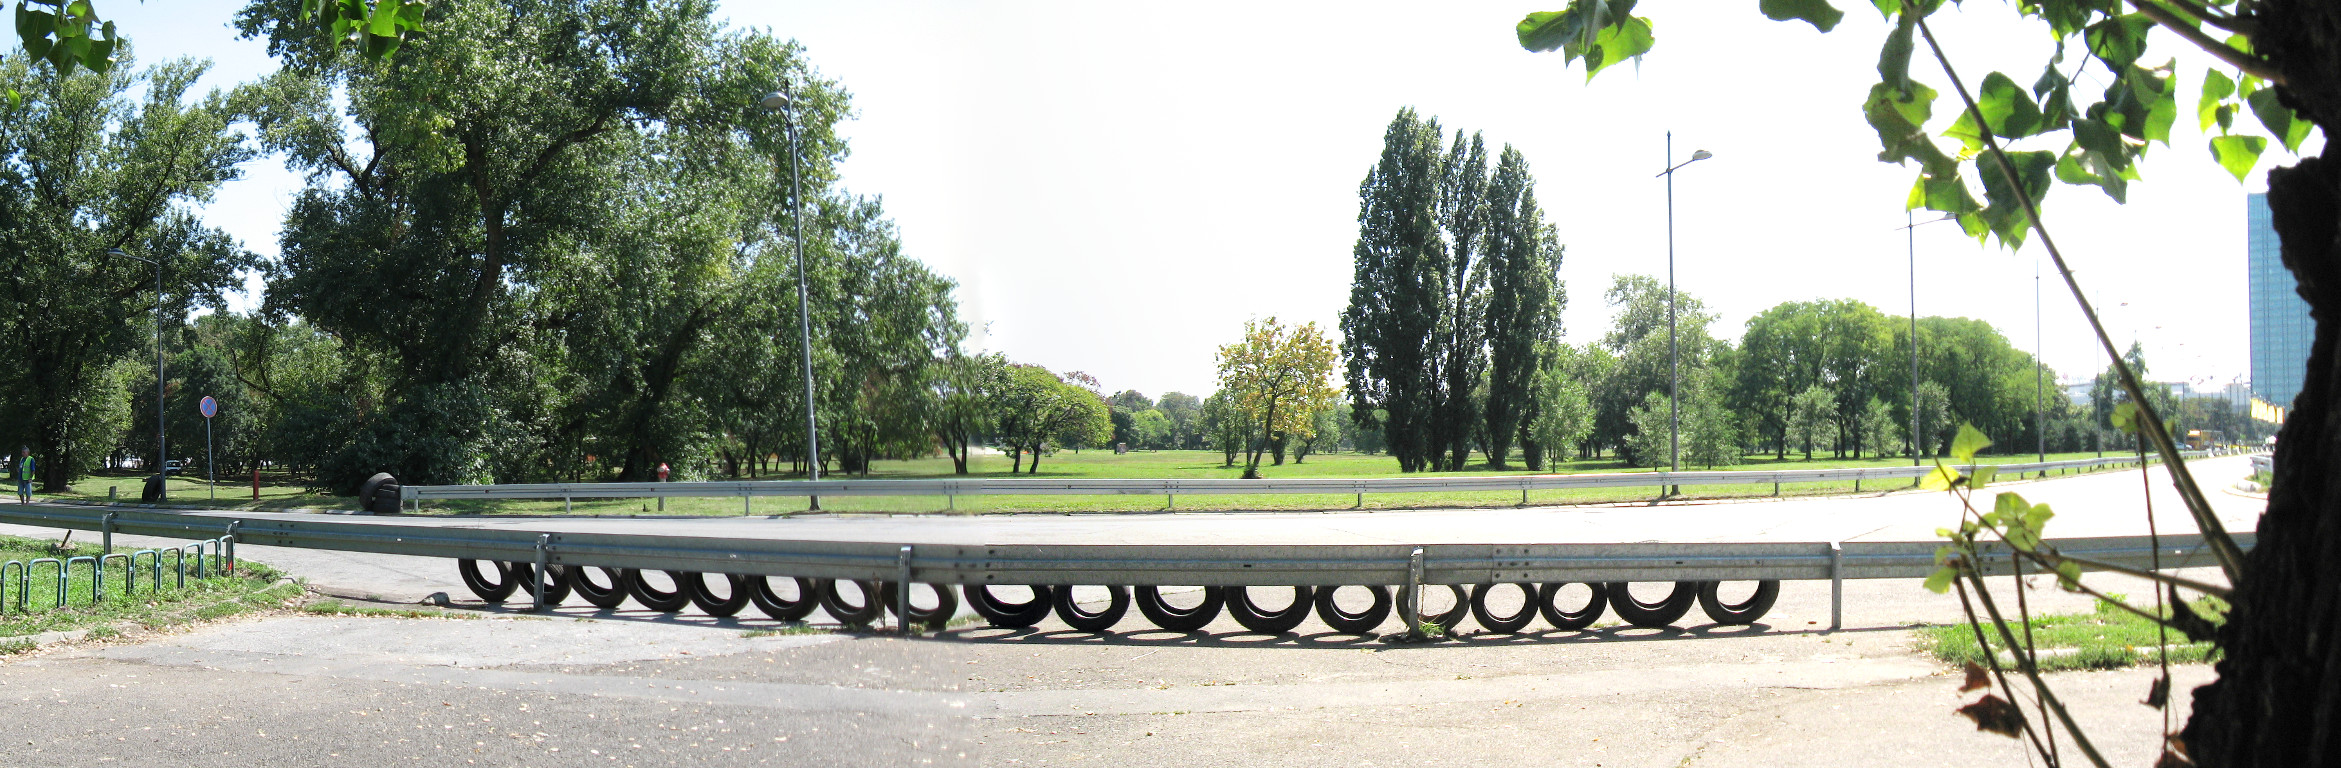 trke panorama